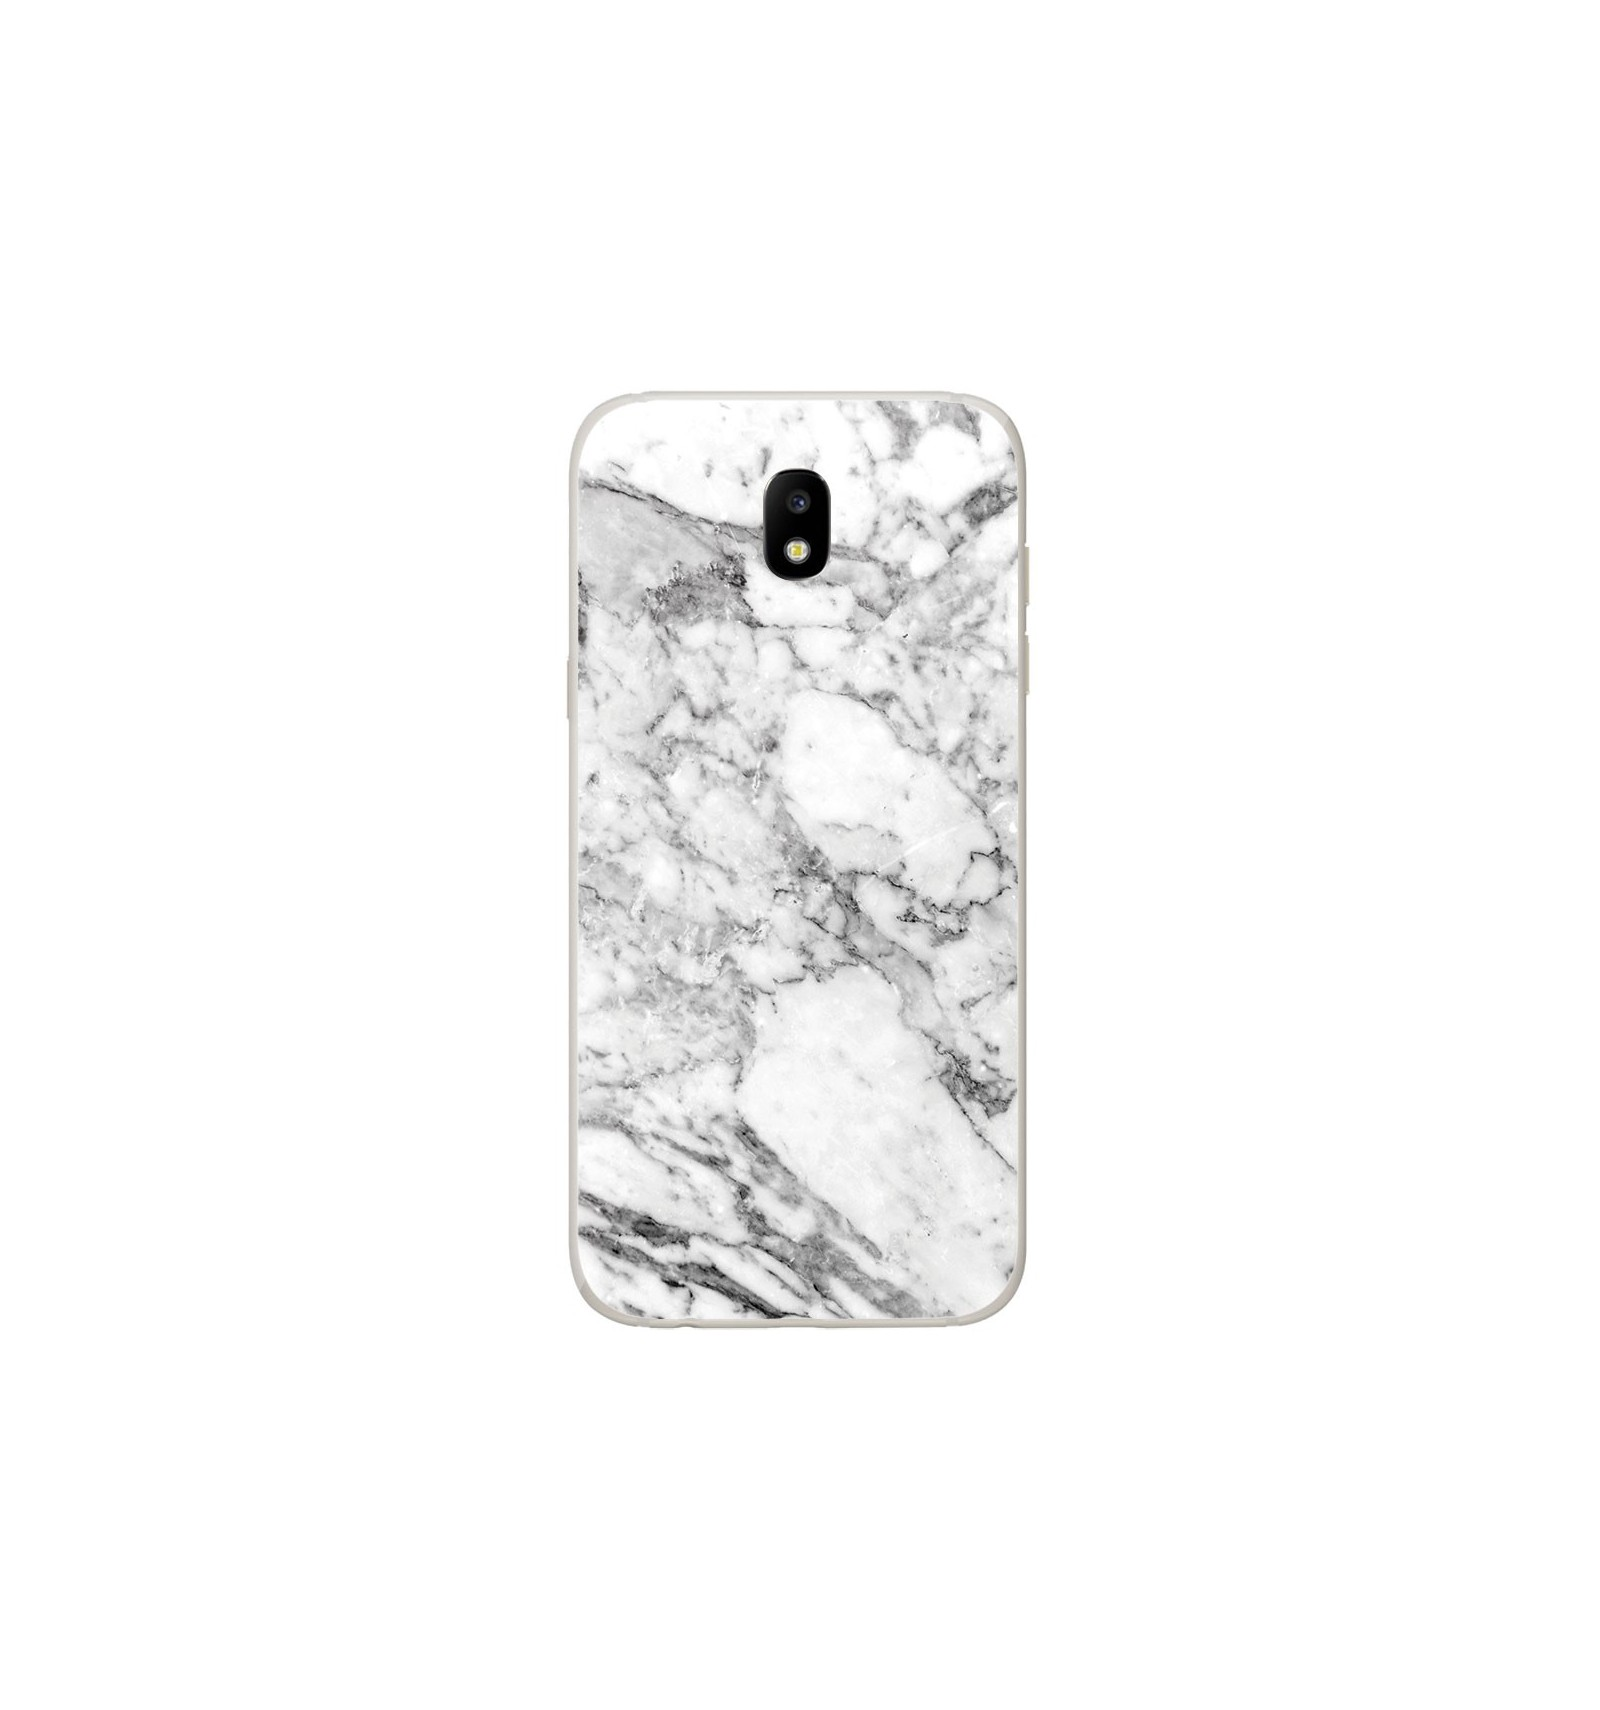 coque huawei p8 lite 2015 marbre